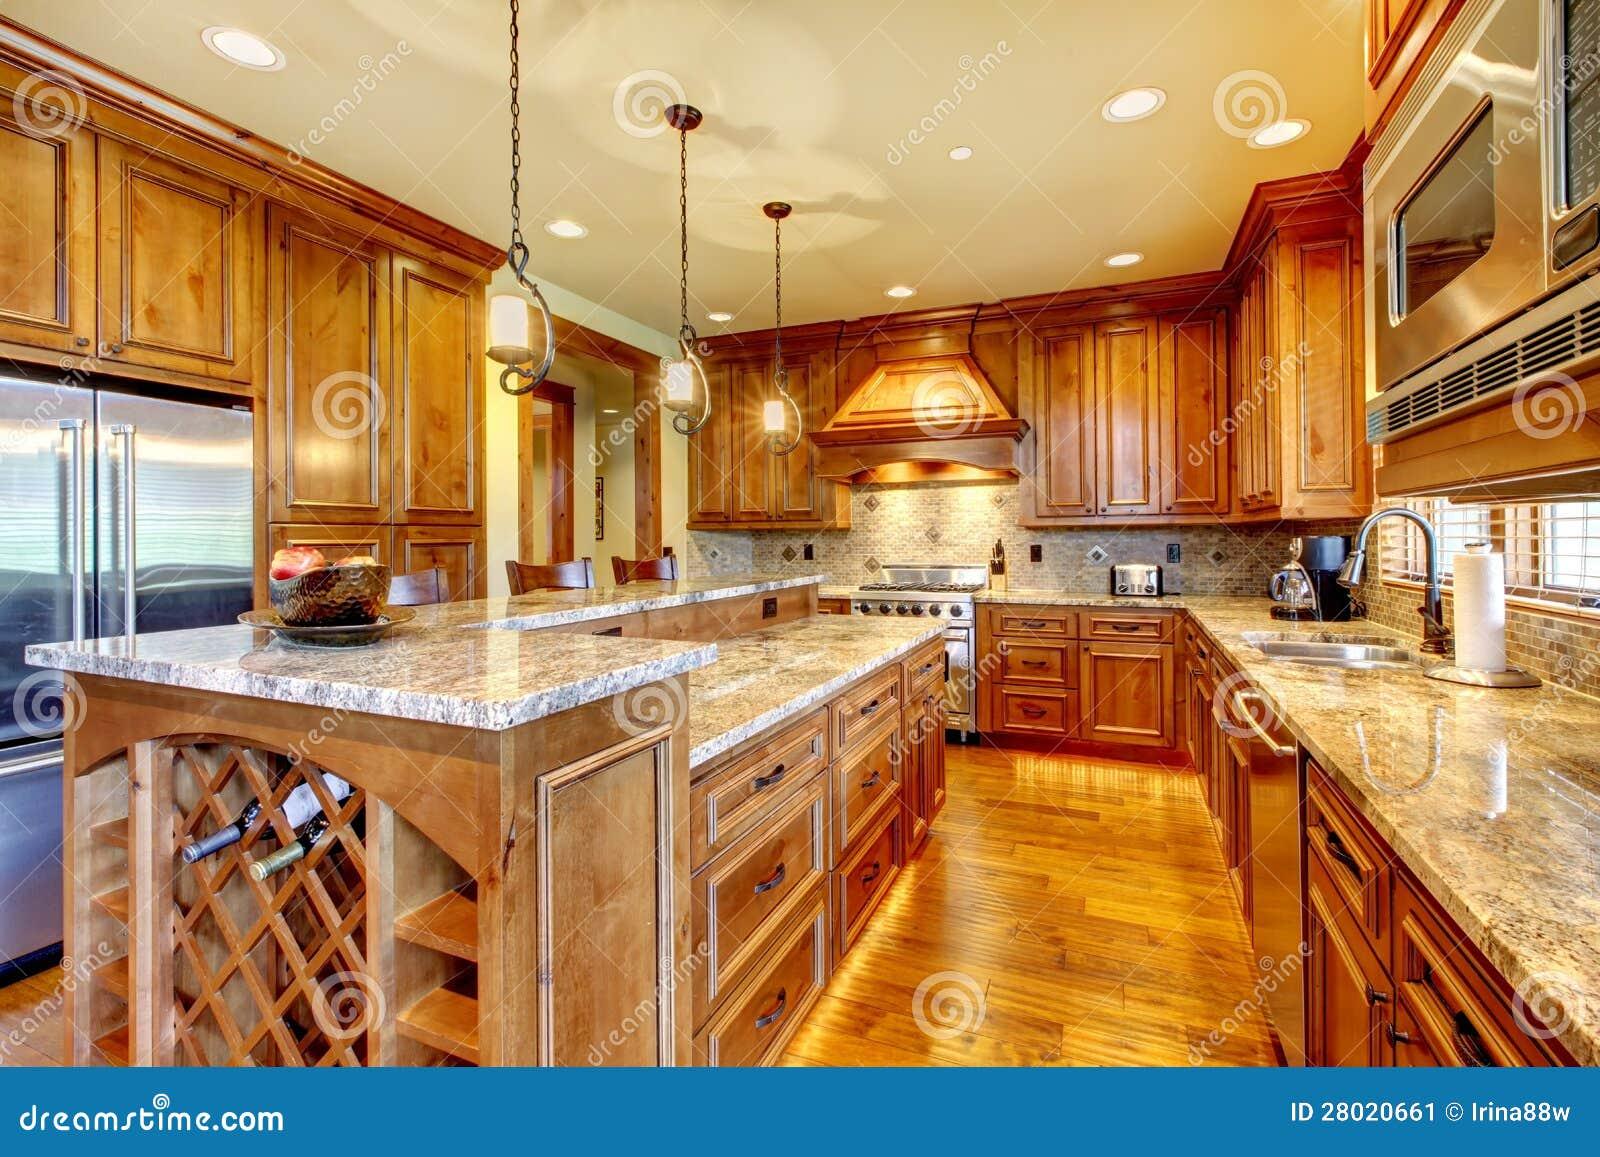 Luxury Wood Kitchen With Granite Countertop Stock Image